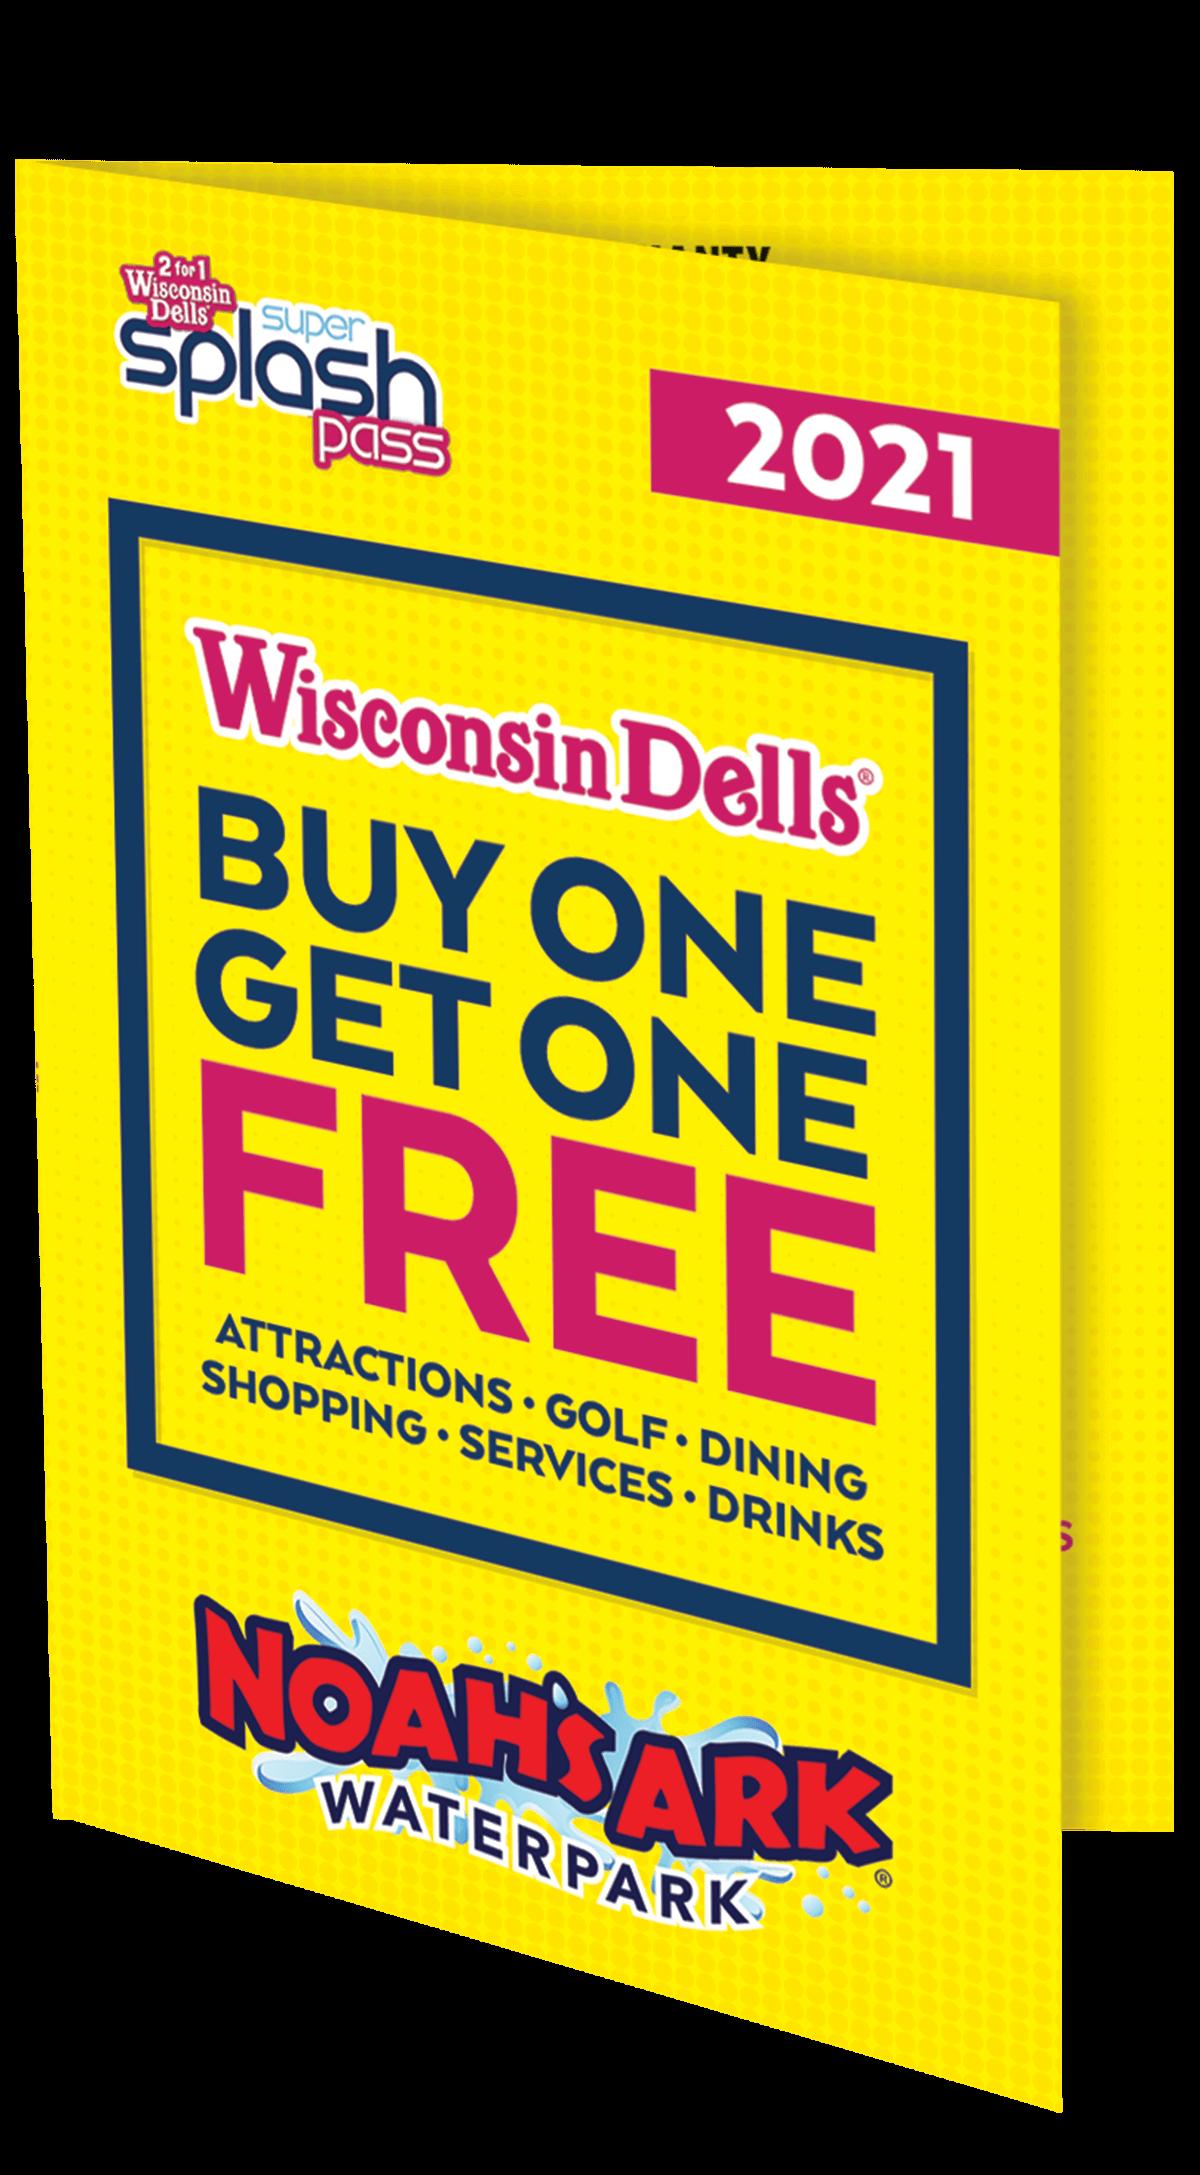 experience-wisdells-coupons-and-savings-splash-pass